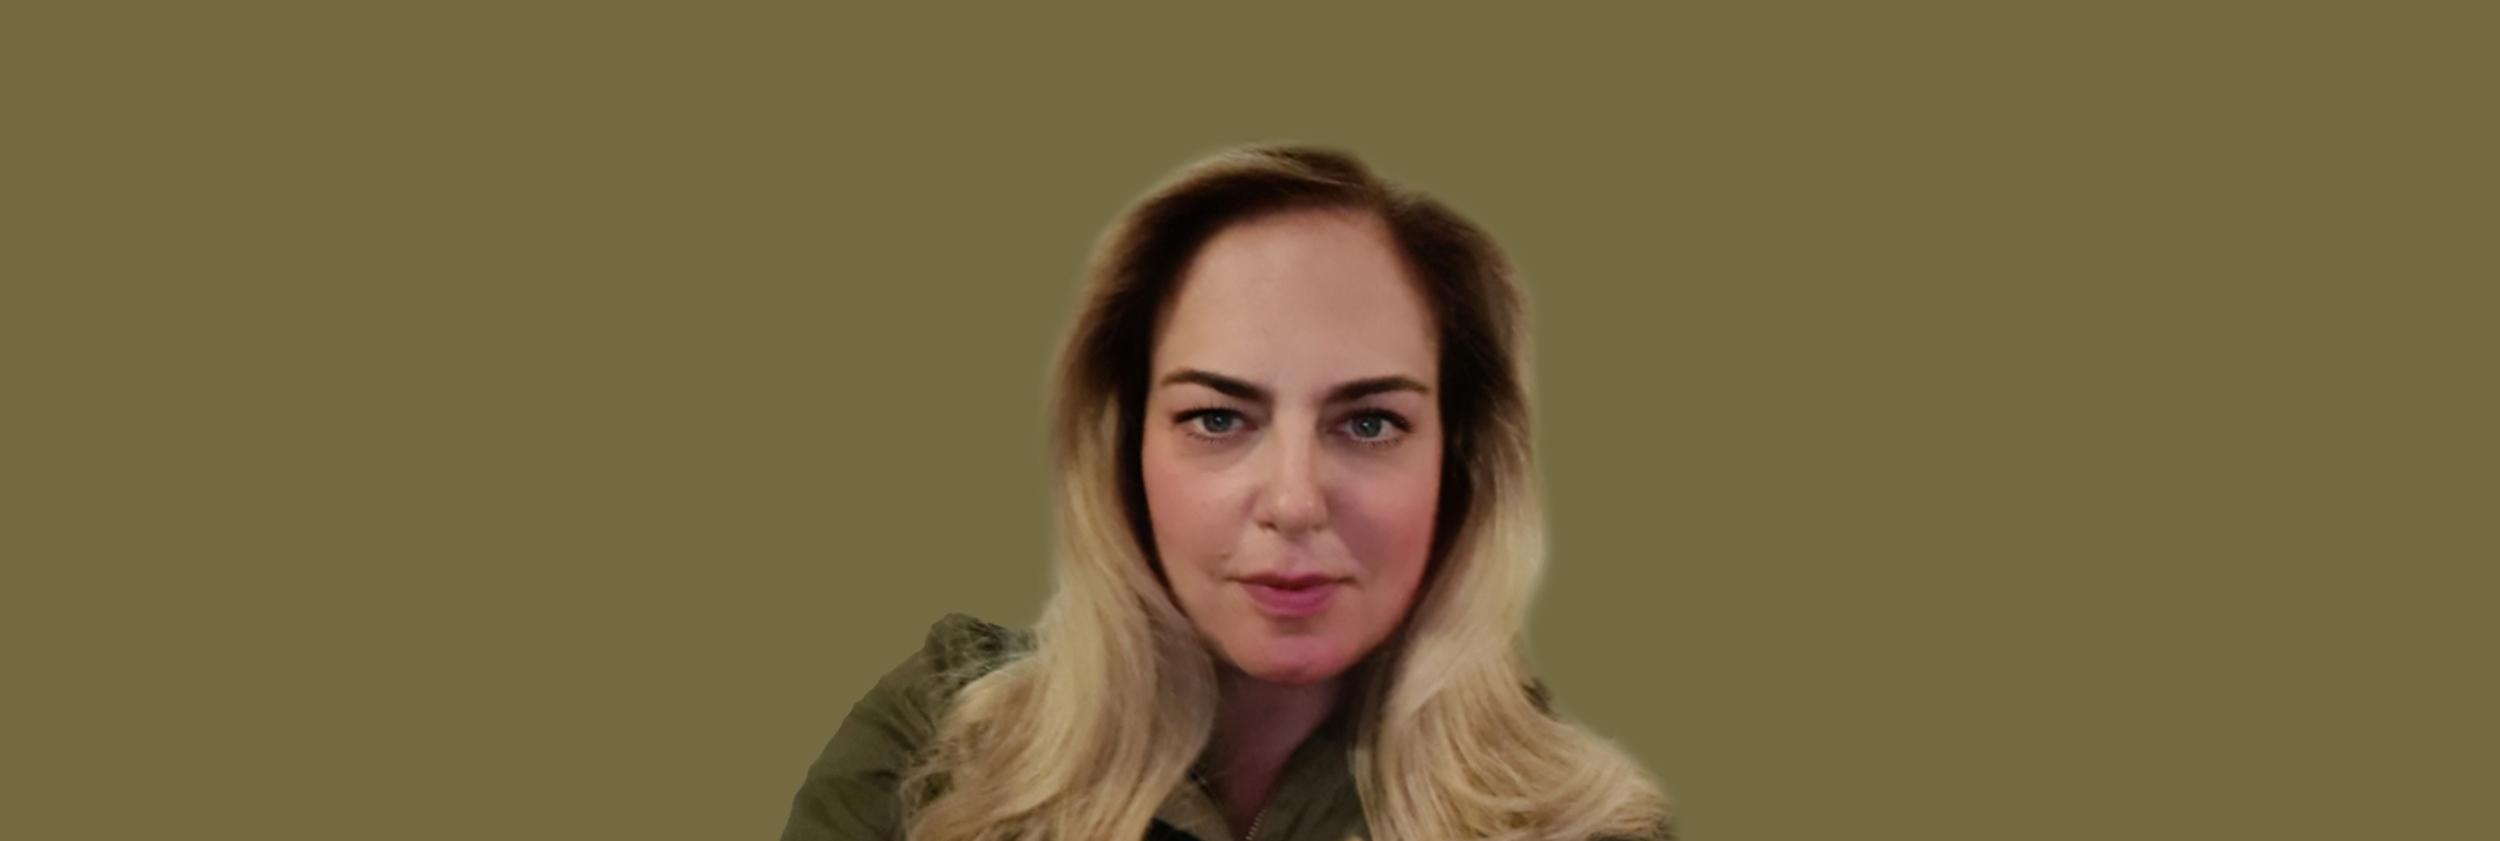 Epoha Portal Kolumnist Elia Pekica